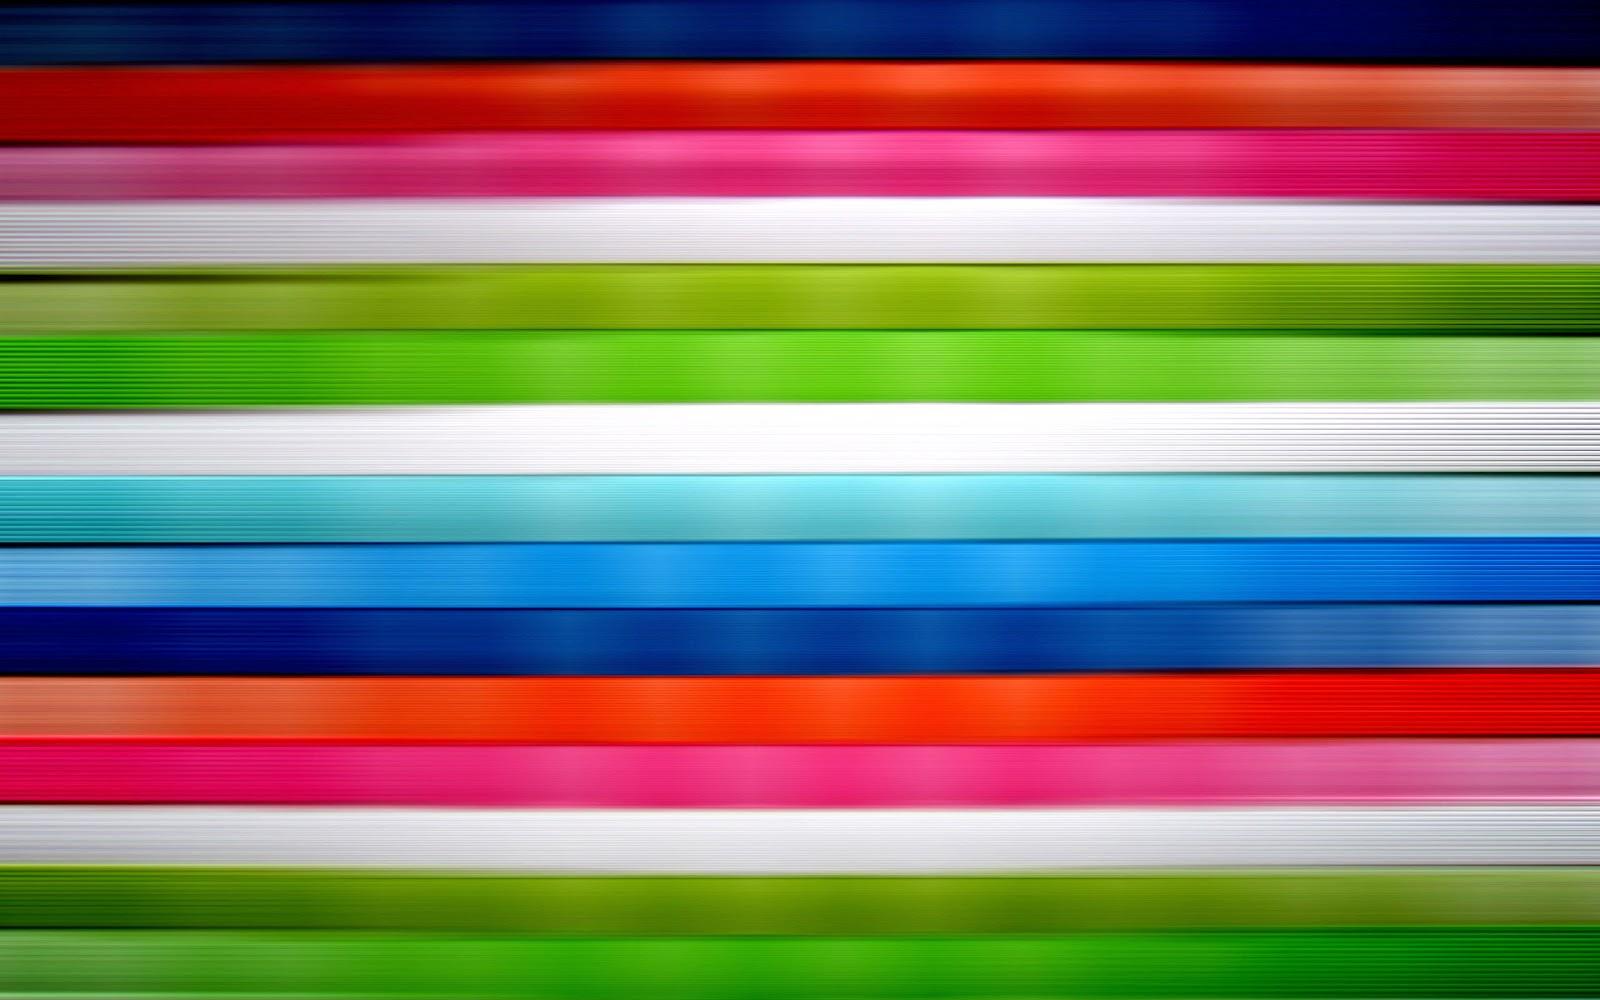 http://4.bp.blogspot.com/-C4x3OdmJmAs/TzyU4EP6ITI/AAAAAAAALq0/d35qyxEGYXw/s1600/vivid-colors-HD_wallpapers.jpg